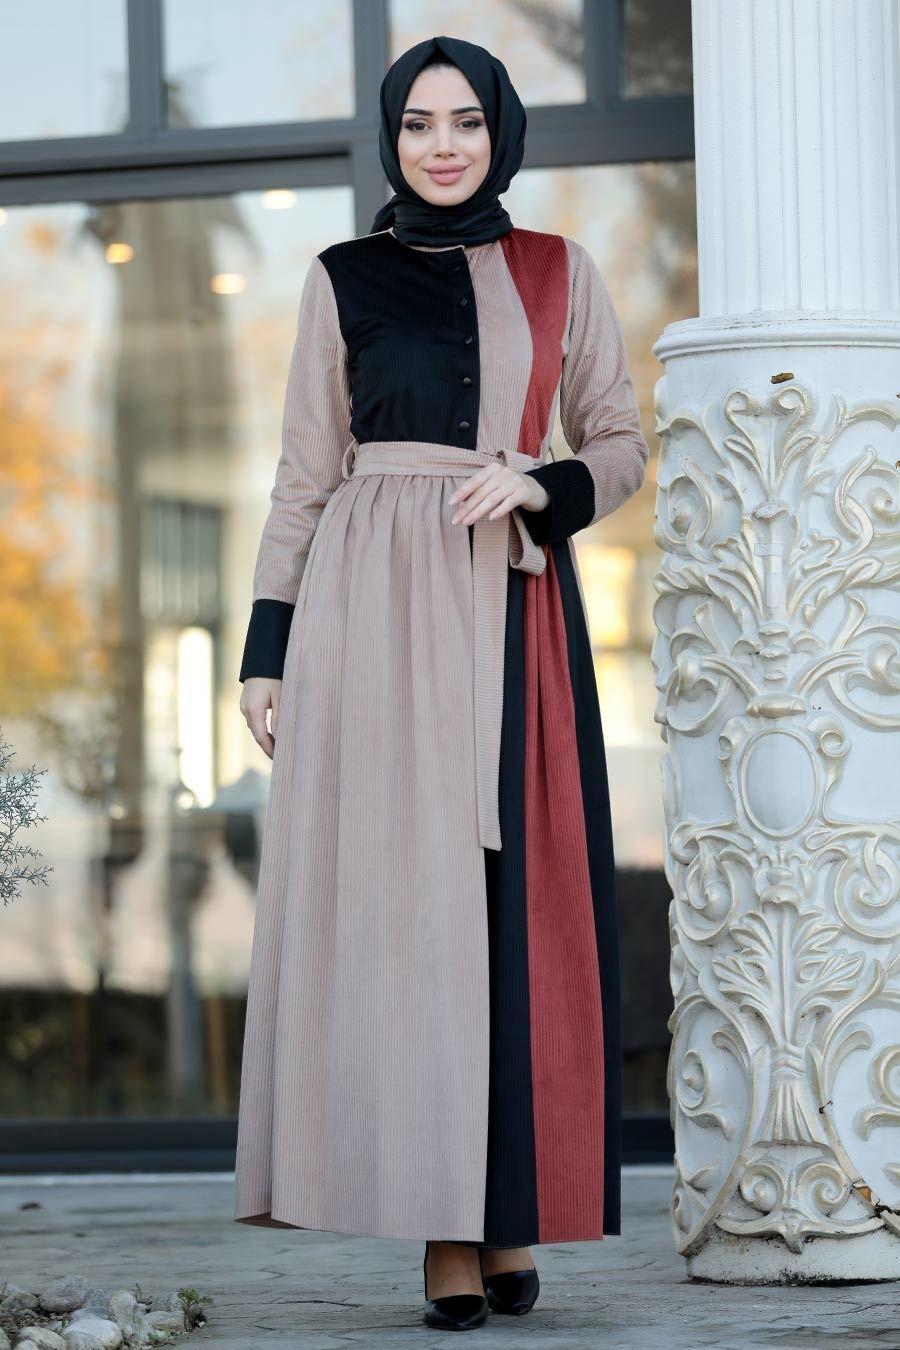 Neva Style Fitilli Kadife Kiremit Tesettur Elbise 22148krmt Tesetturisland Com Elbise Siyah Elbise Kadife